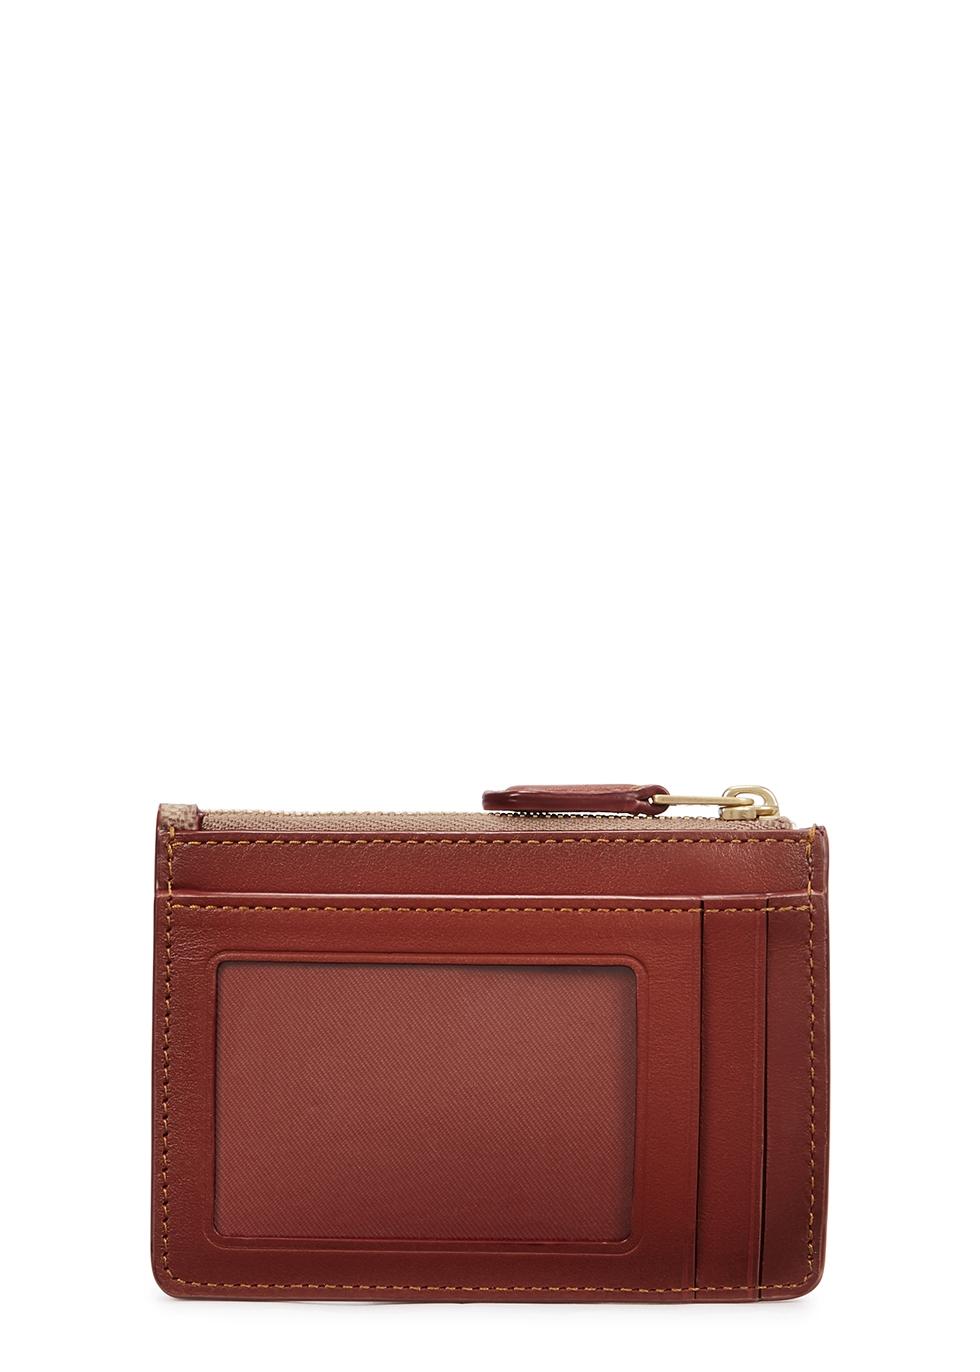 Mini brown leather card holder - Coach